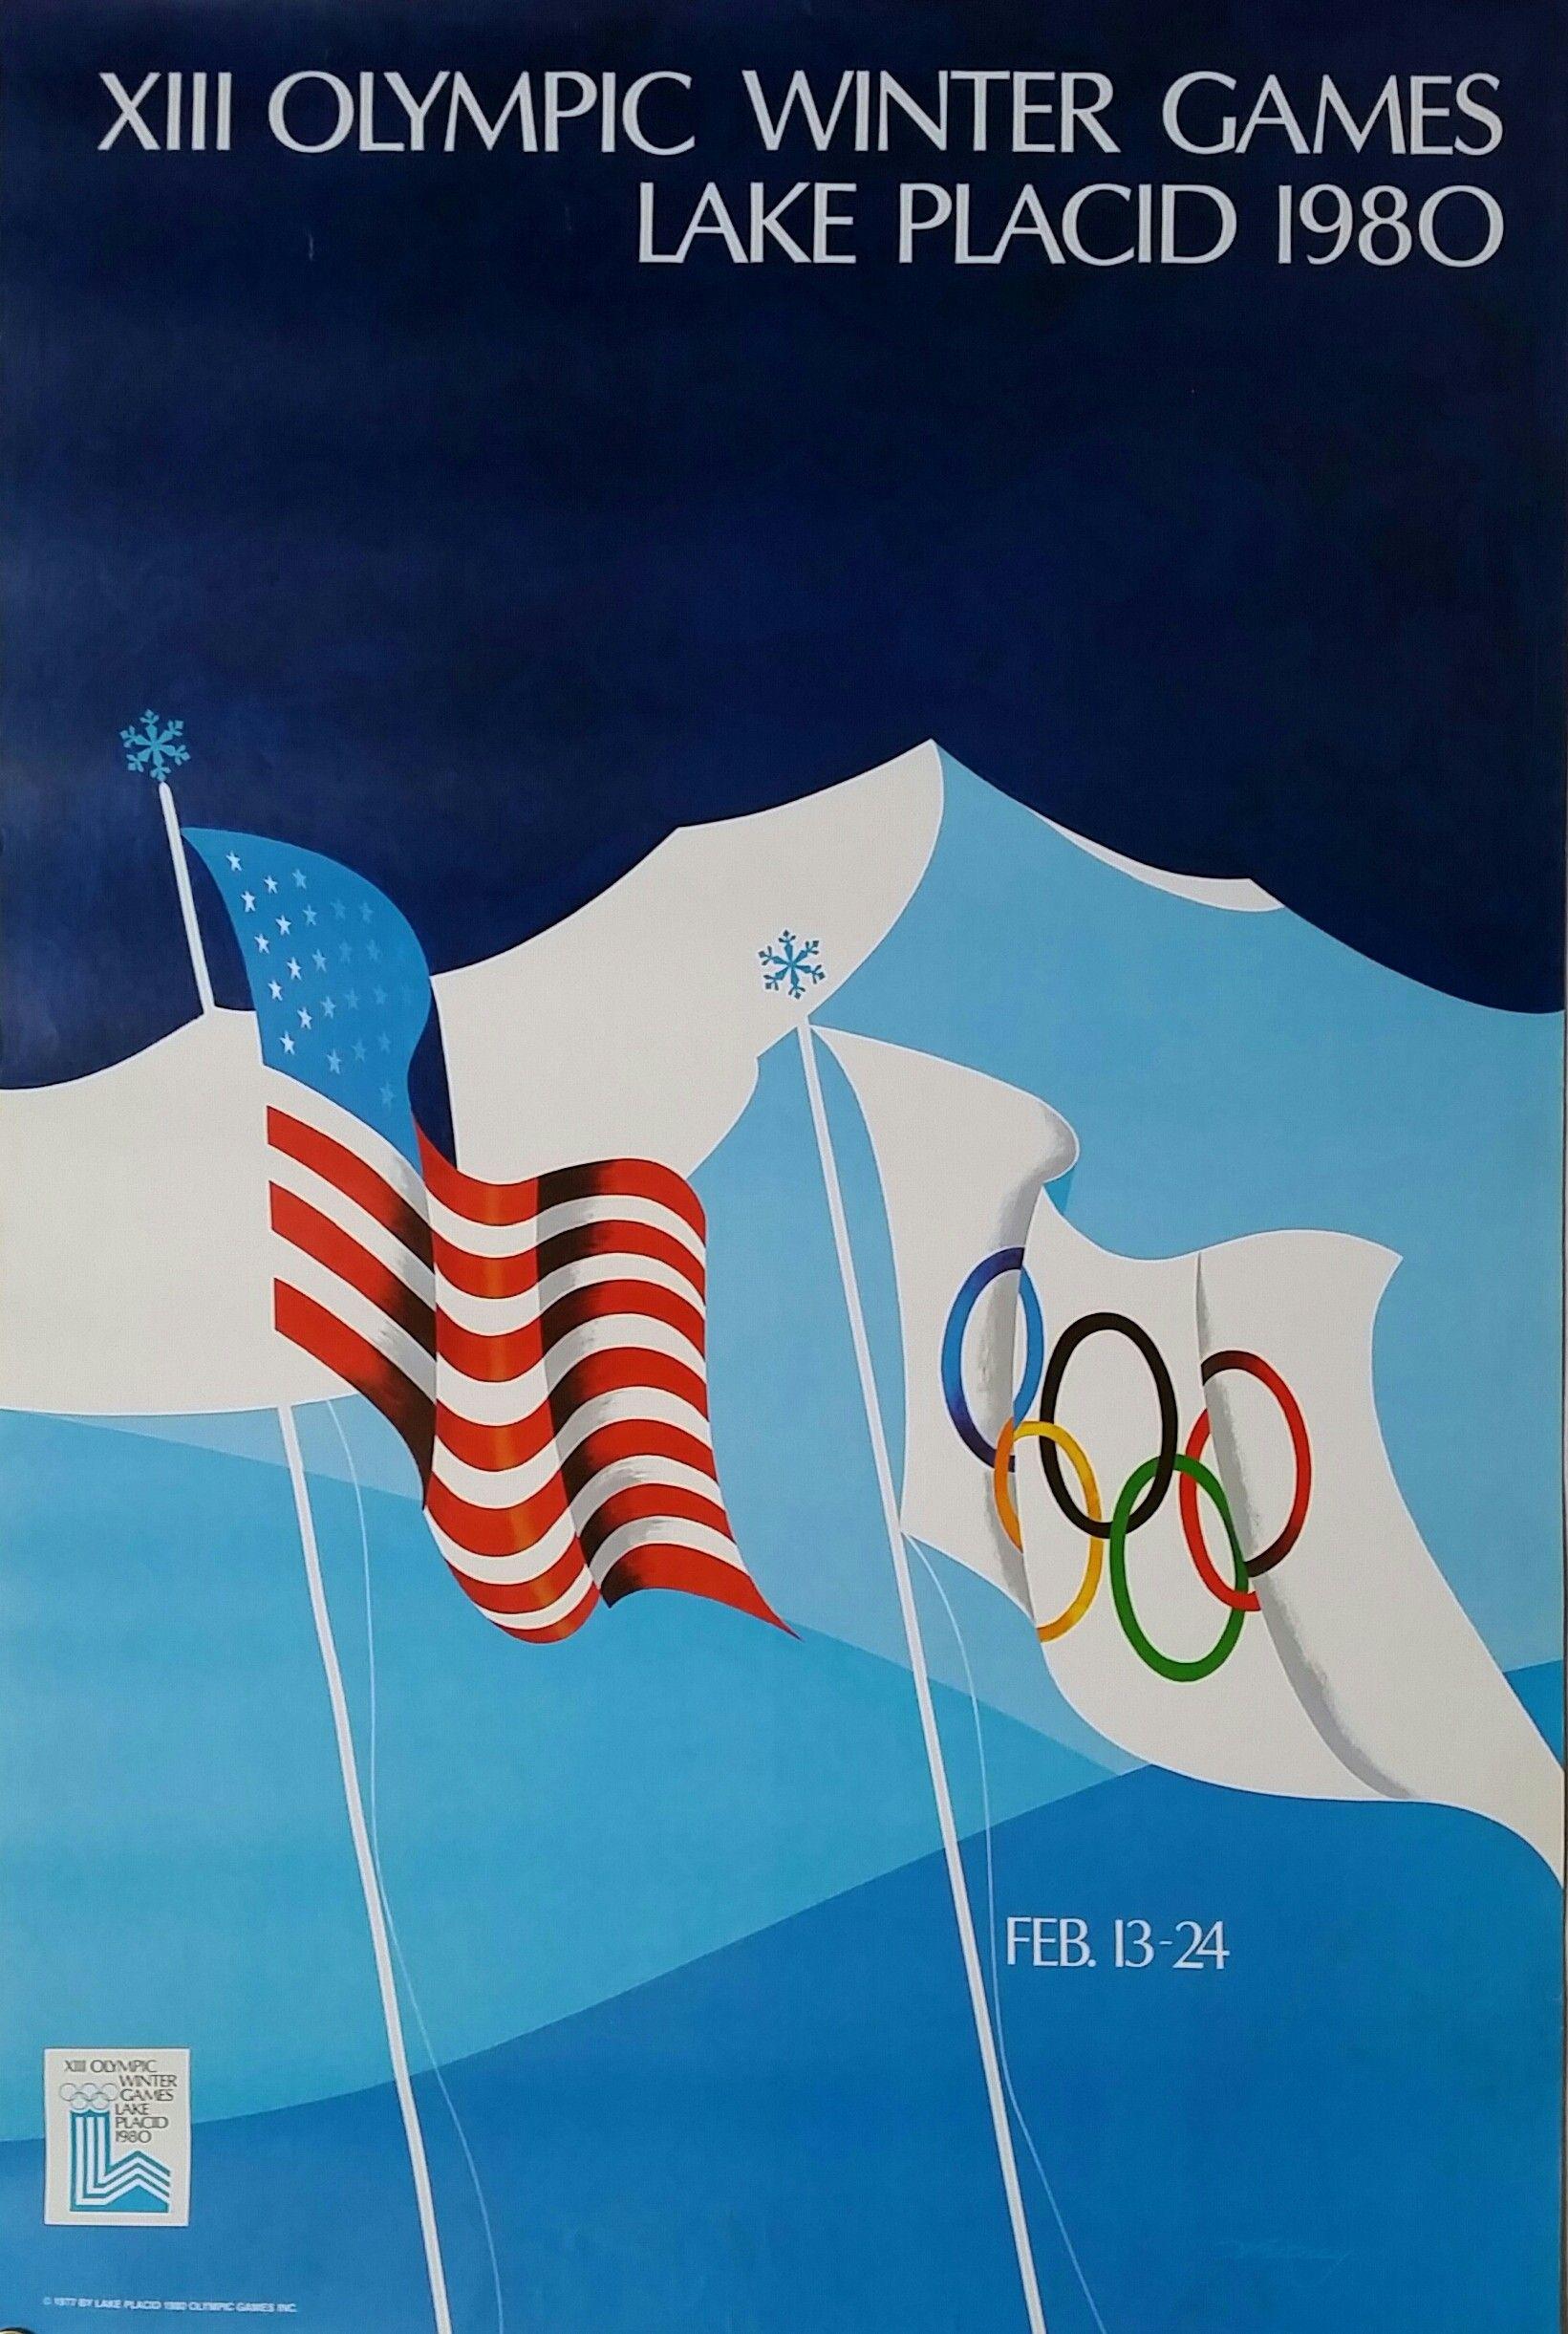 1984 Winter Olympics Sarajevo A3 Poster Reprint